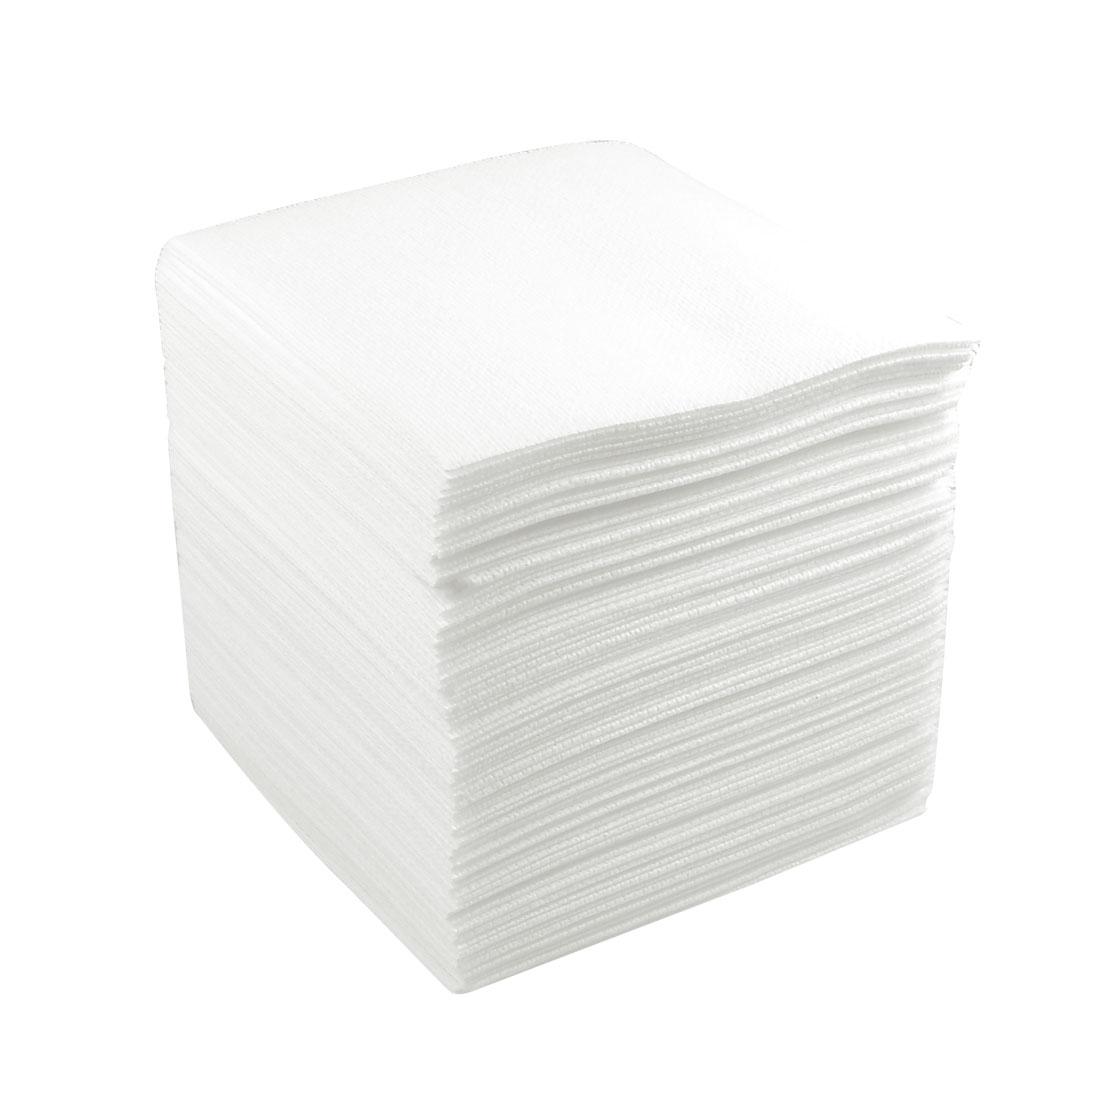 100 Pcs PCB Clean Cleanroom Wiper White 250mm x 250mm